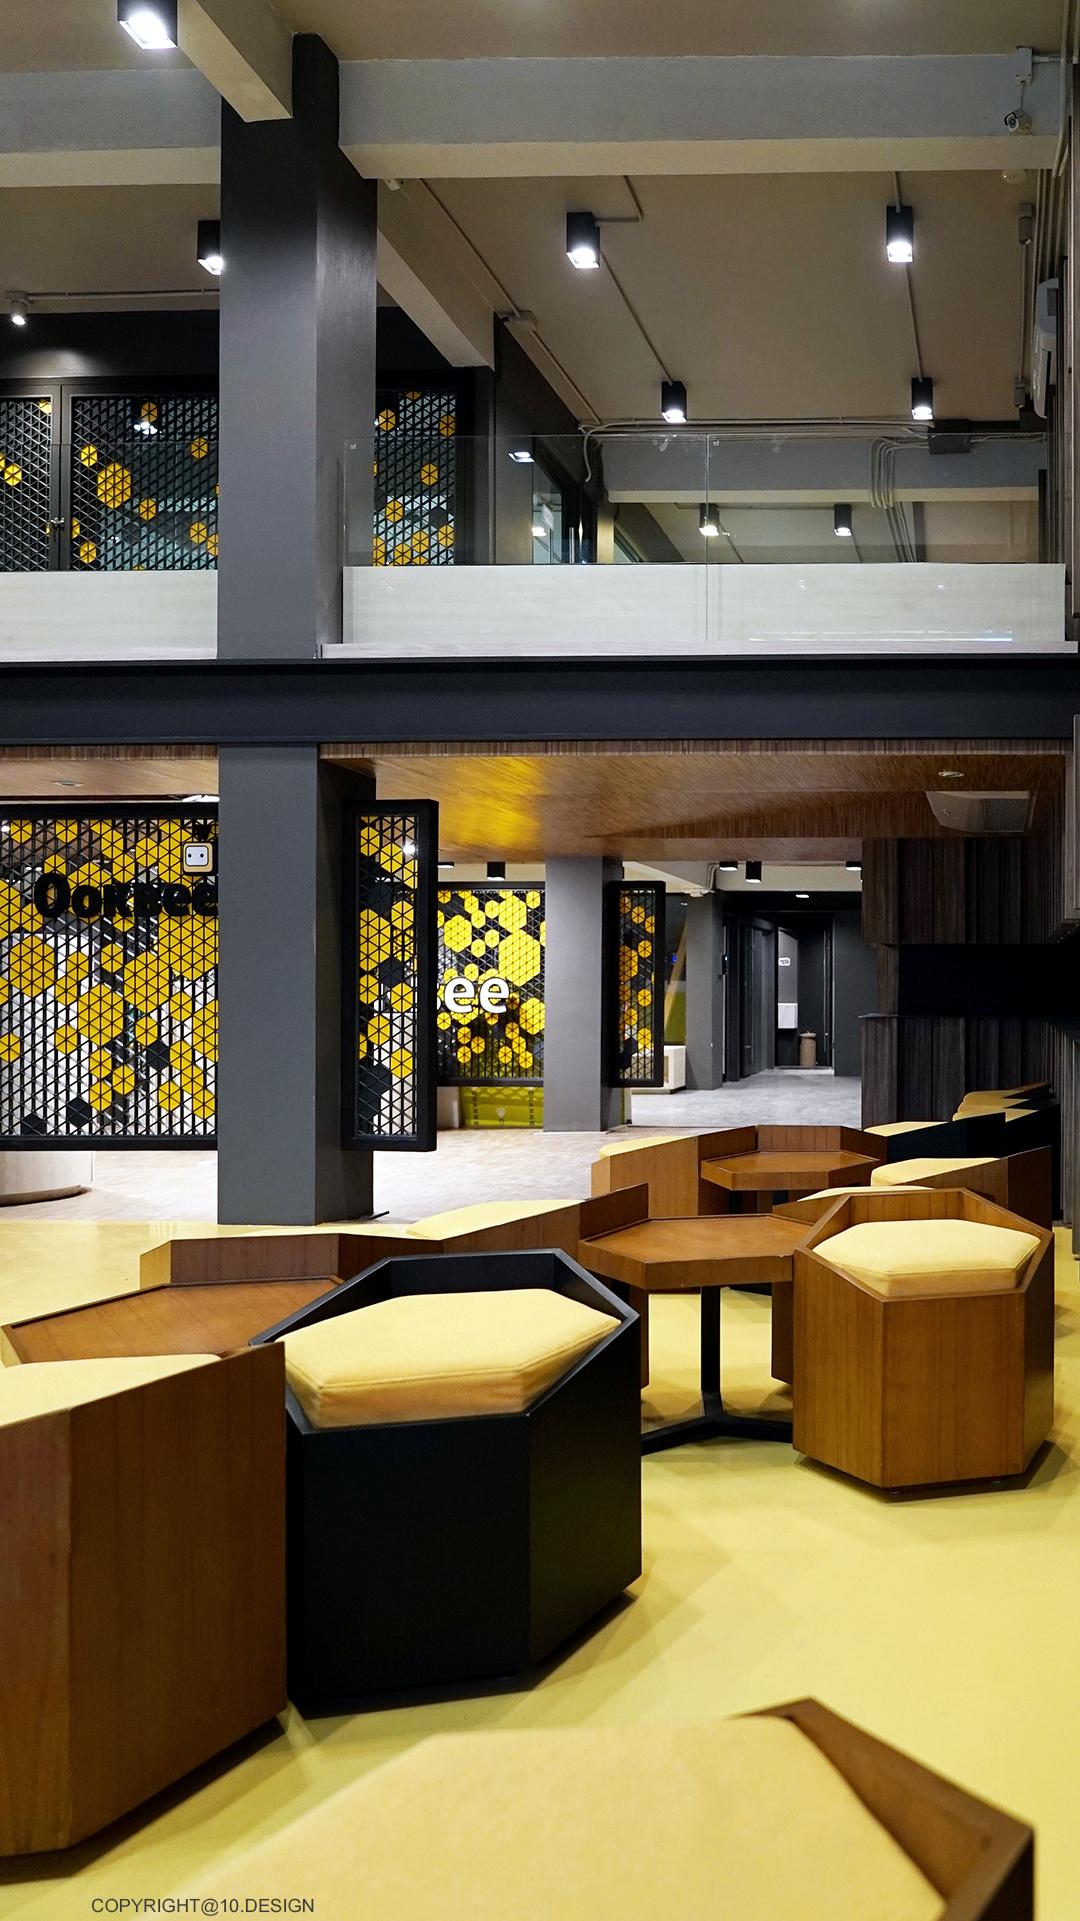 10DESIGN ookbee head office interior design start up 09